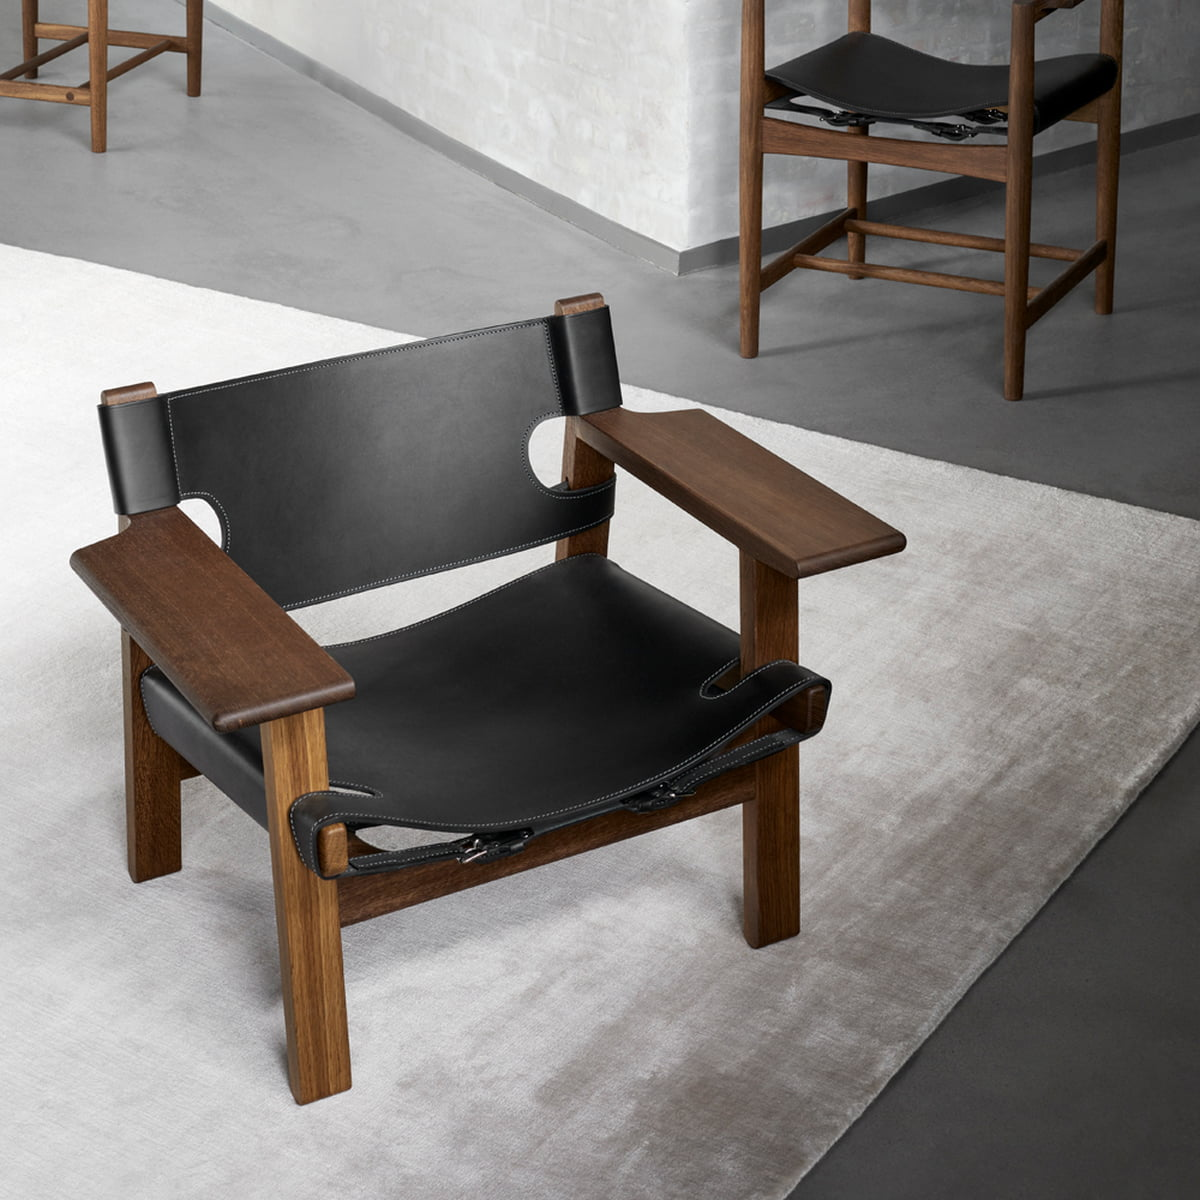 Fredericia Spanish Chair Eiche Geolt Leder Cognac